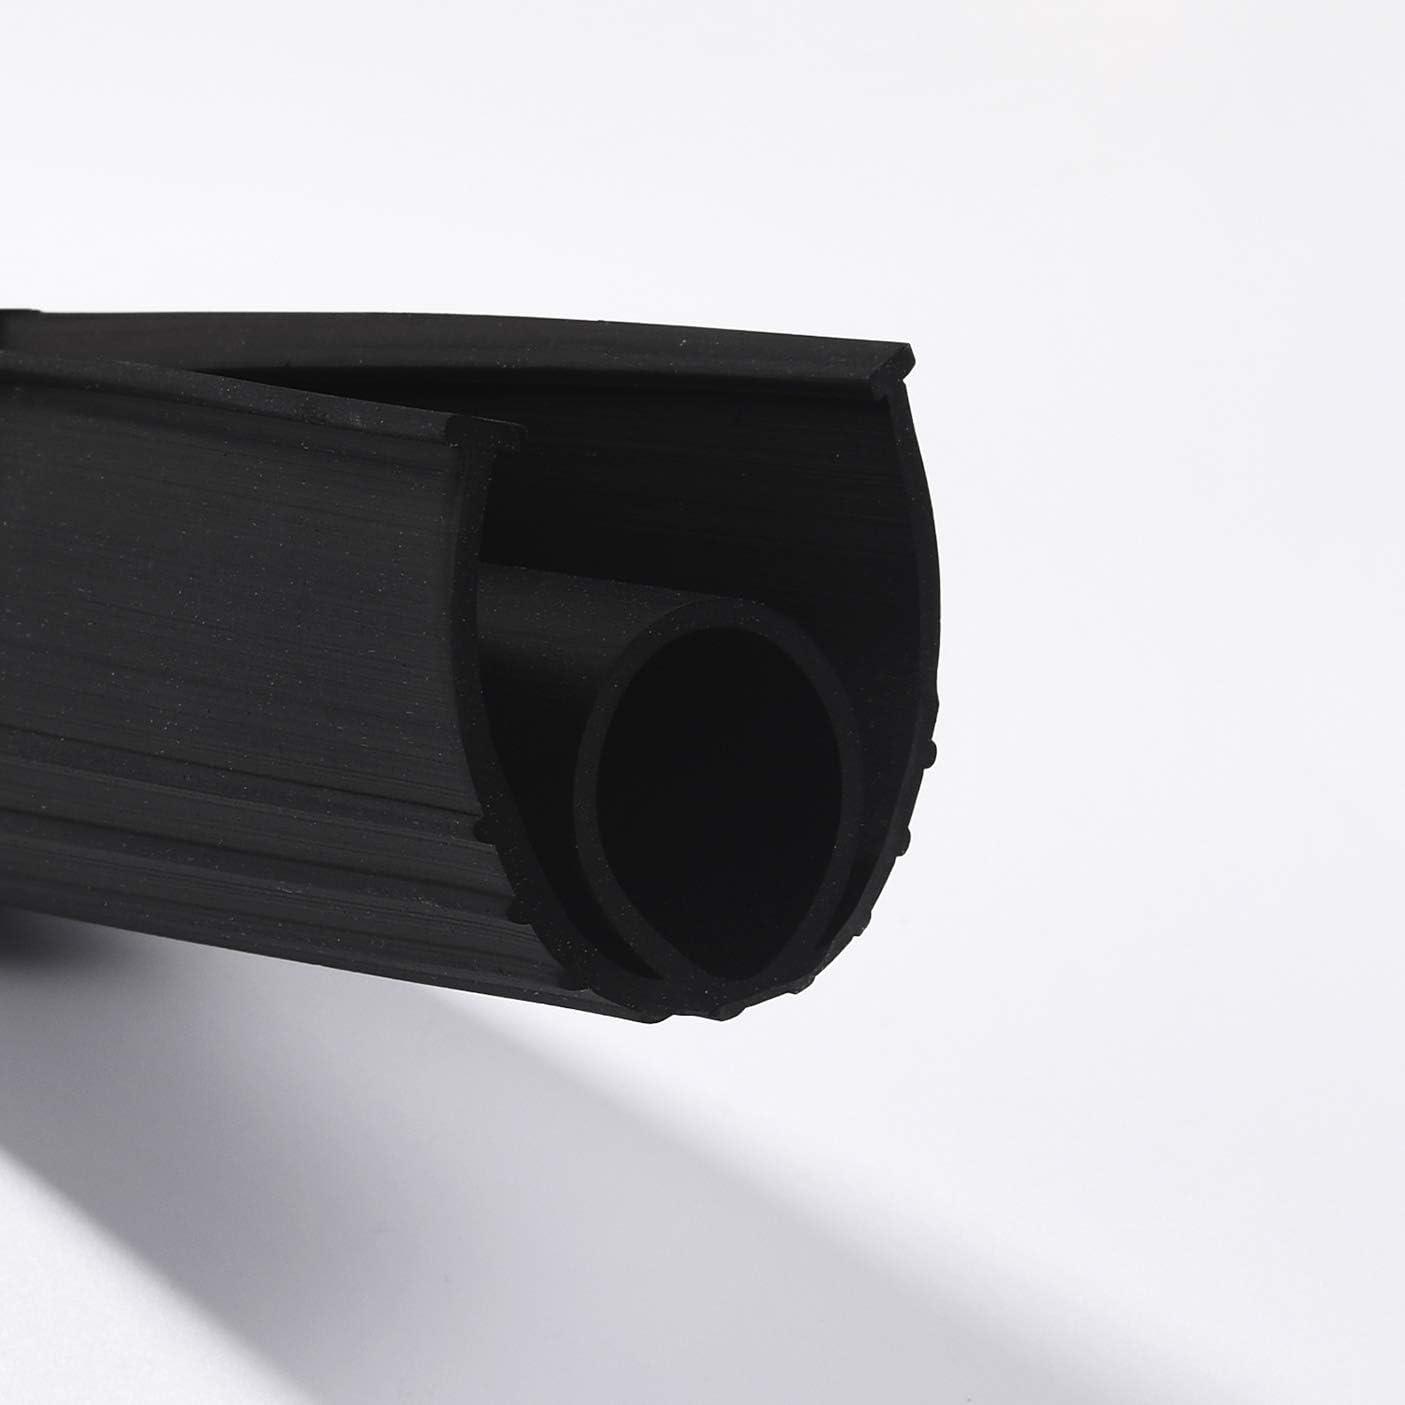 BOWSEN Garage Door Seals Bottom Rubber Weatherproof Threshold Buffering Replacement Black 1//4 Inch T-End,16ft Long